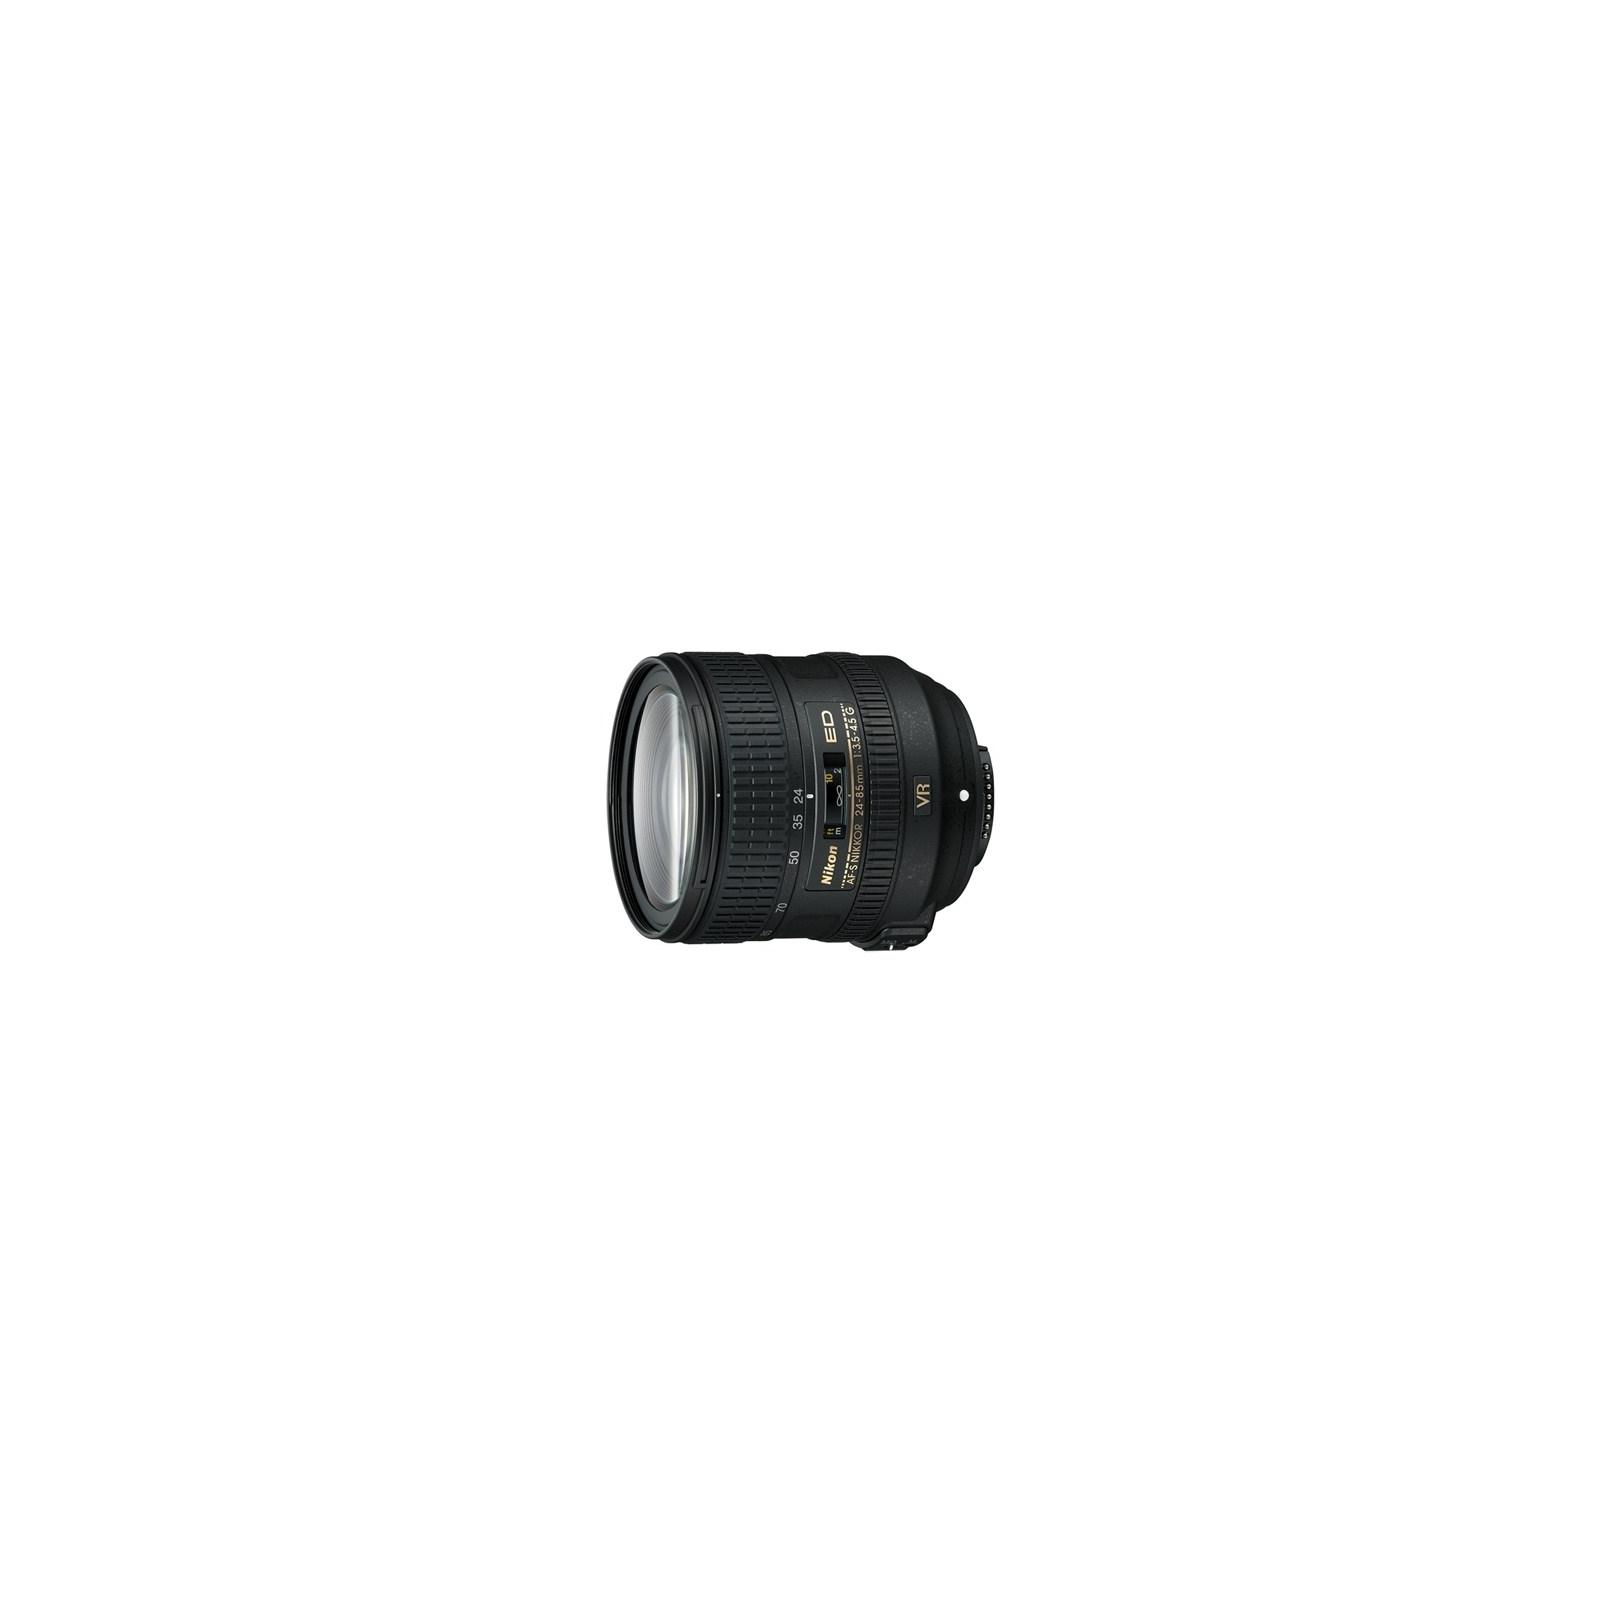 Объектив Nikon AF-S 24-85mm f/3.5-4.5G ED VR (JAA816DA)